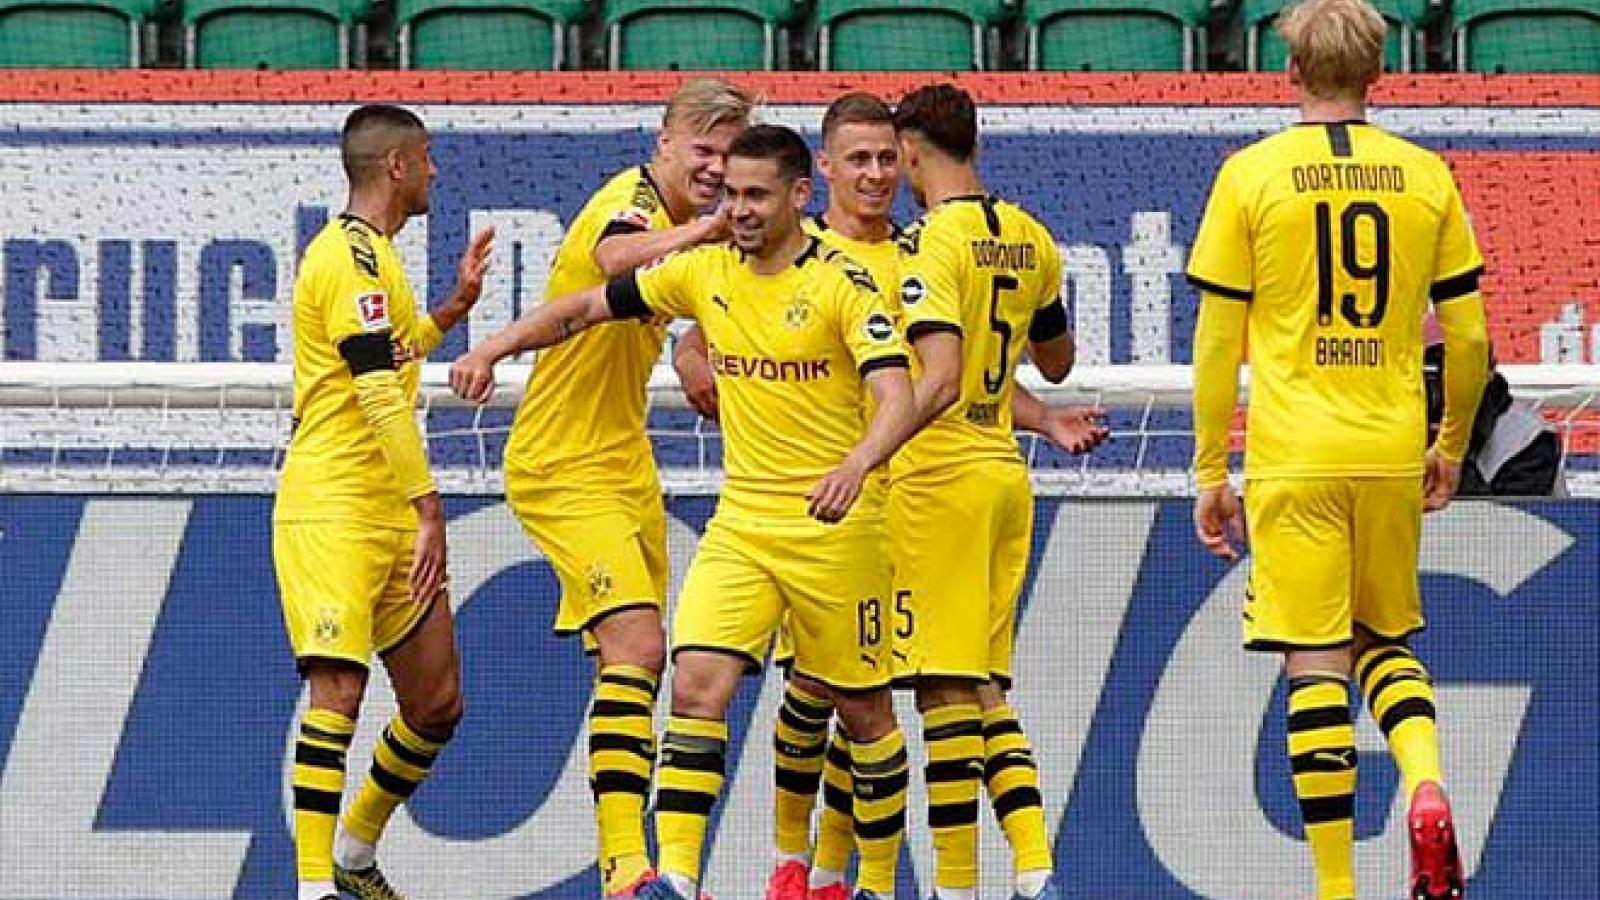 Haaland im tiếng, Dortmund vẫn đả bại Wolfsburg